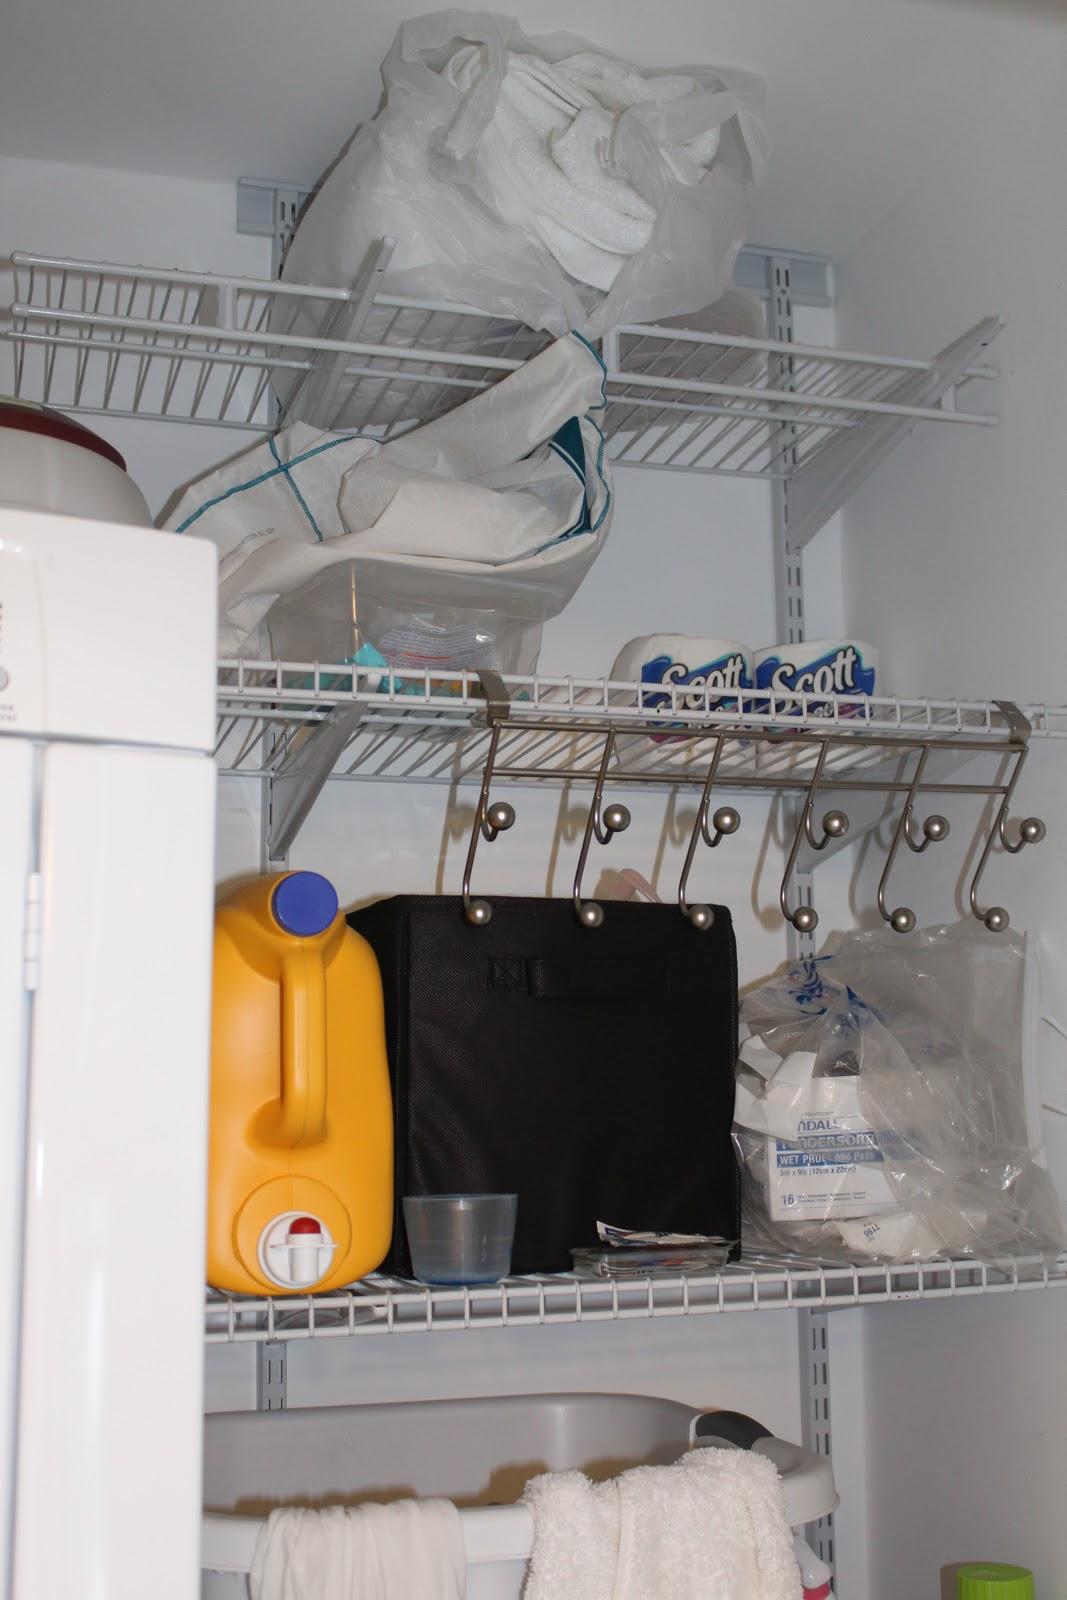 Tizzi Lish: Bathroom Closet/Laundry Organizing